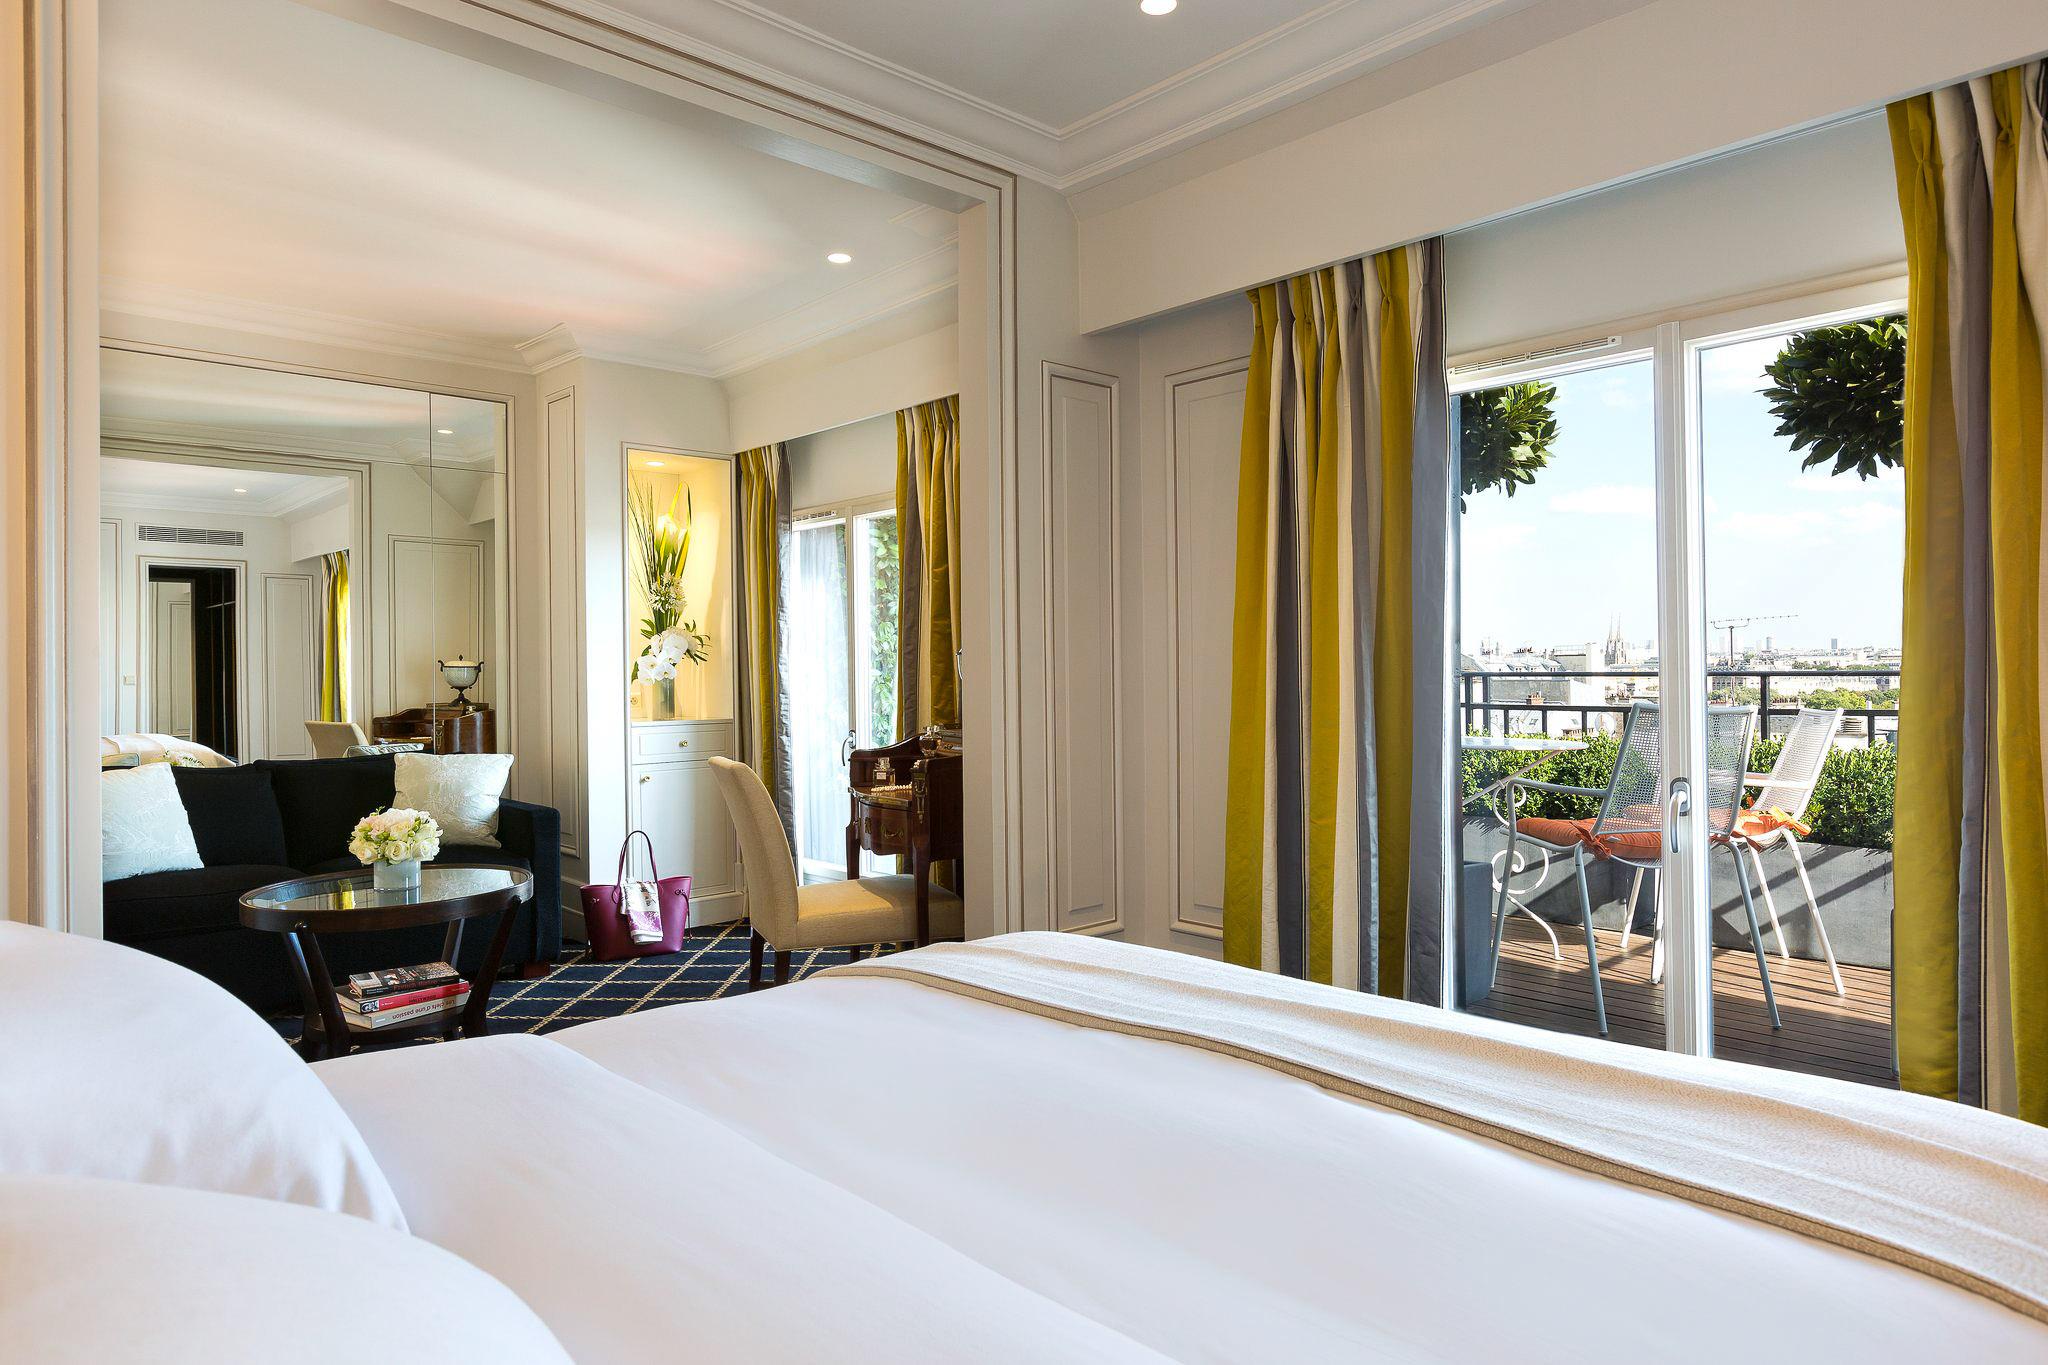 ckanani-Hotel San Regis4.jpg